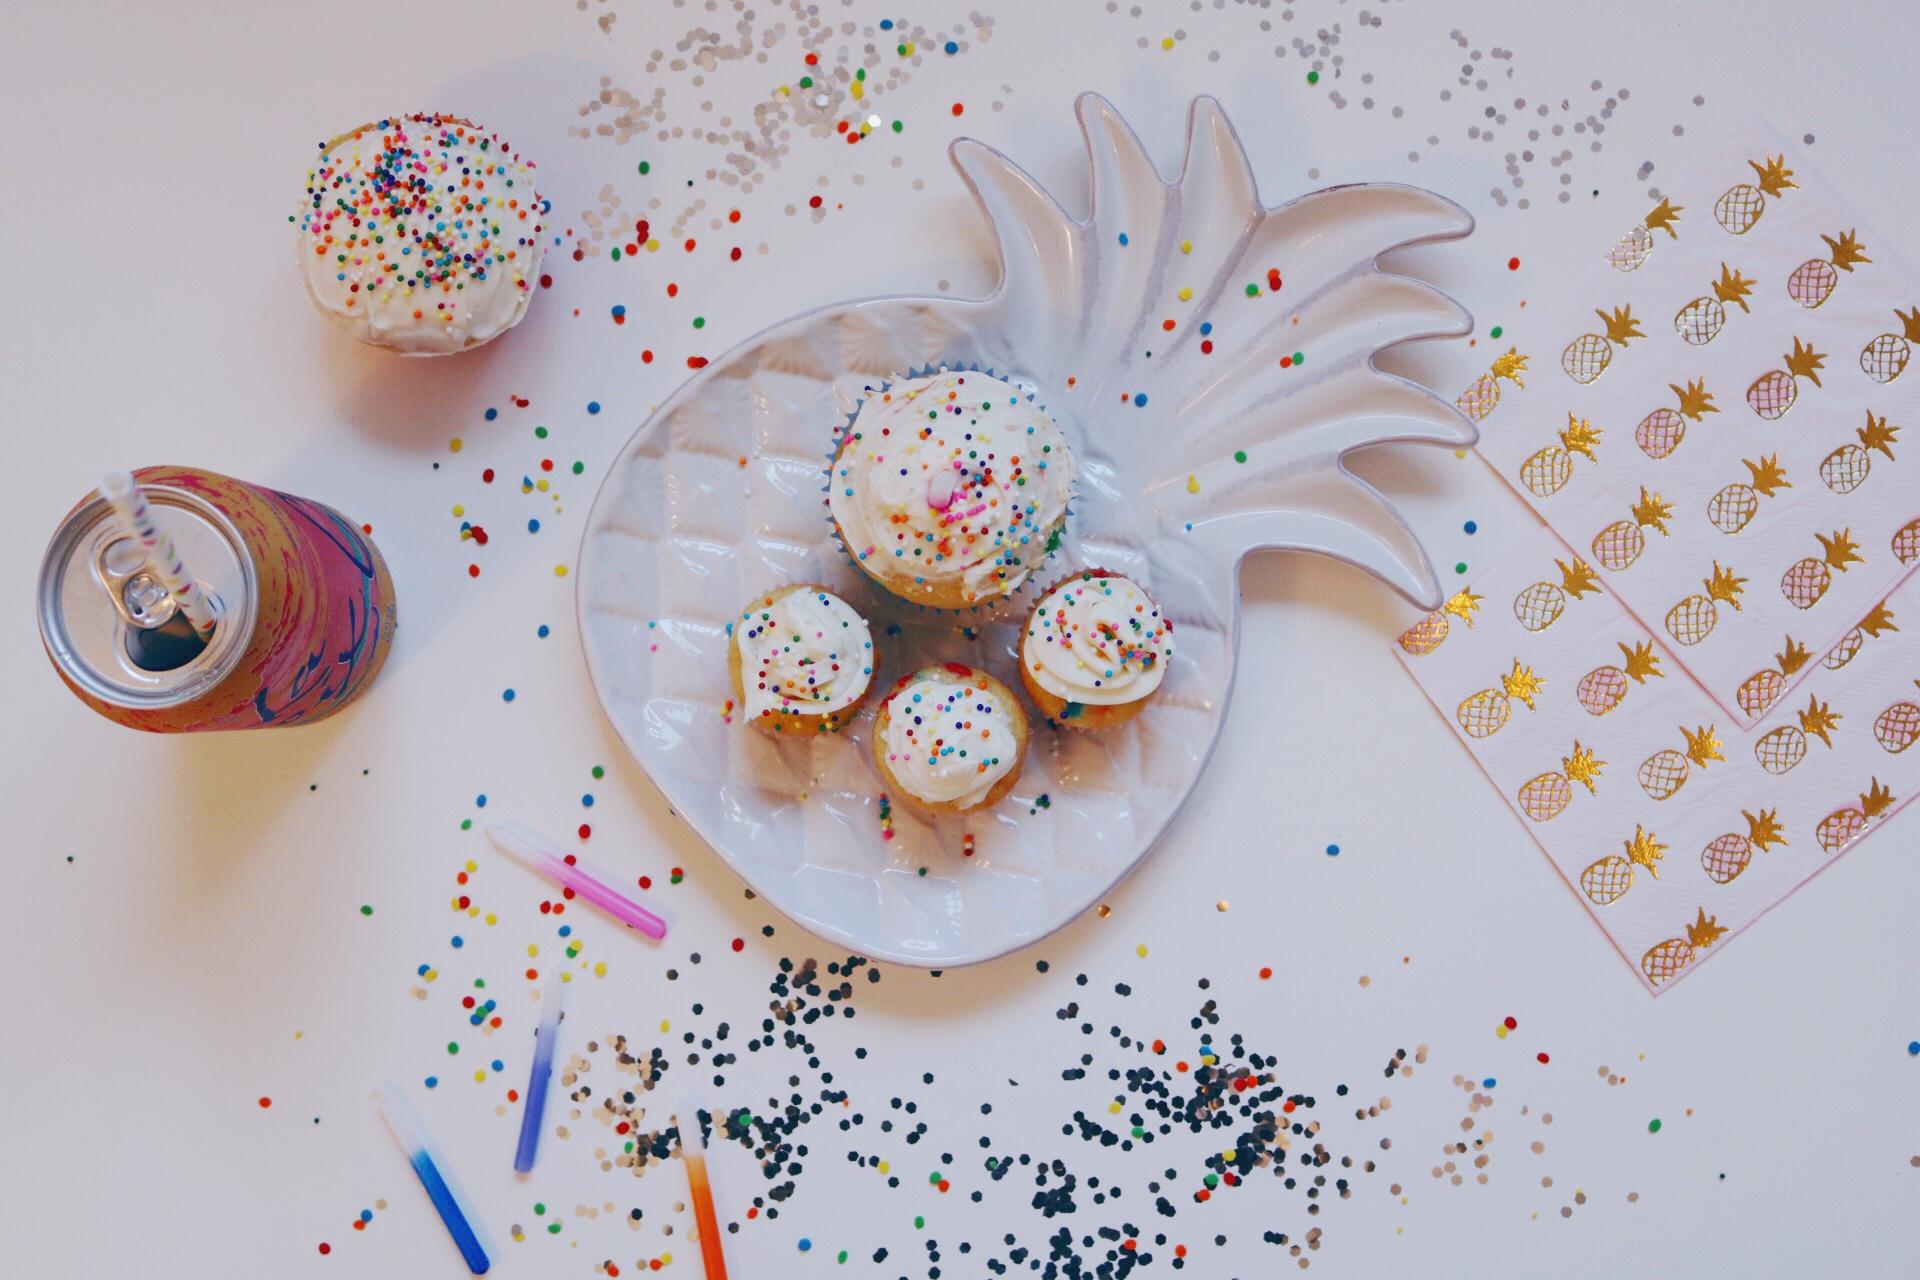 Happy Birthday cupcakes pineapple serving platter